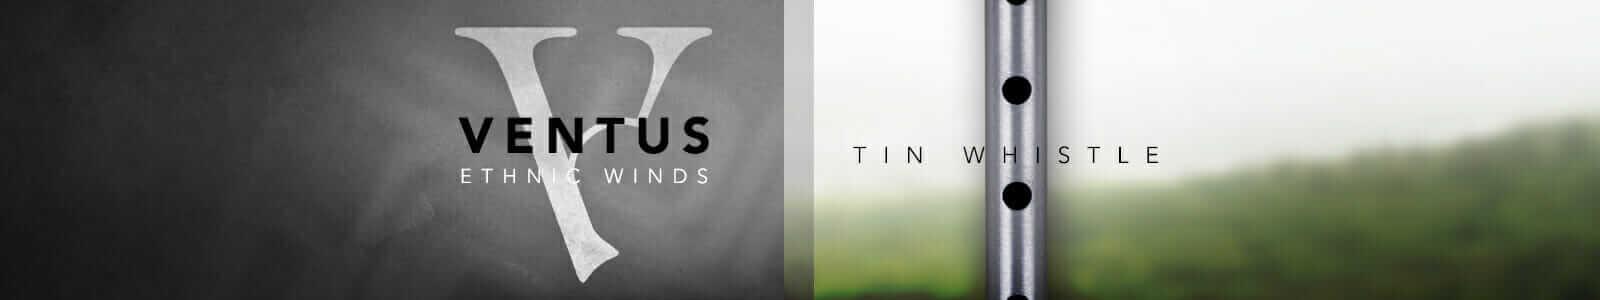 Ventus Ethnic Winds - Tin Whistle (VST, AU, AAX)